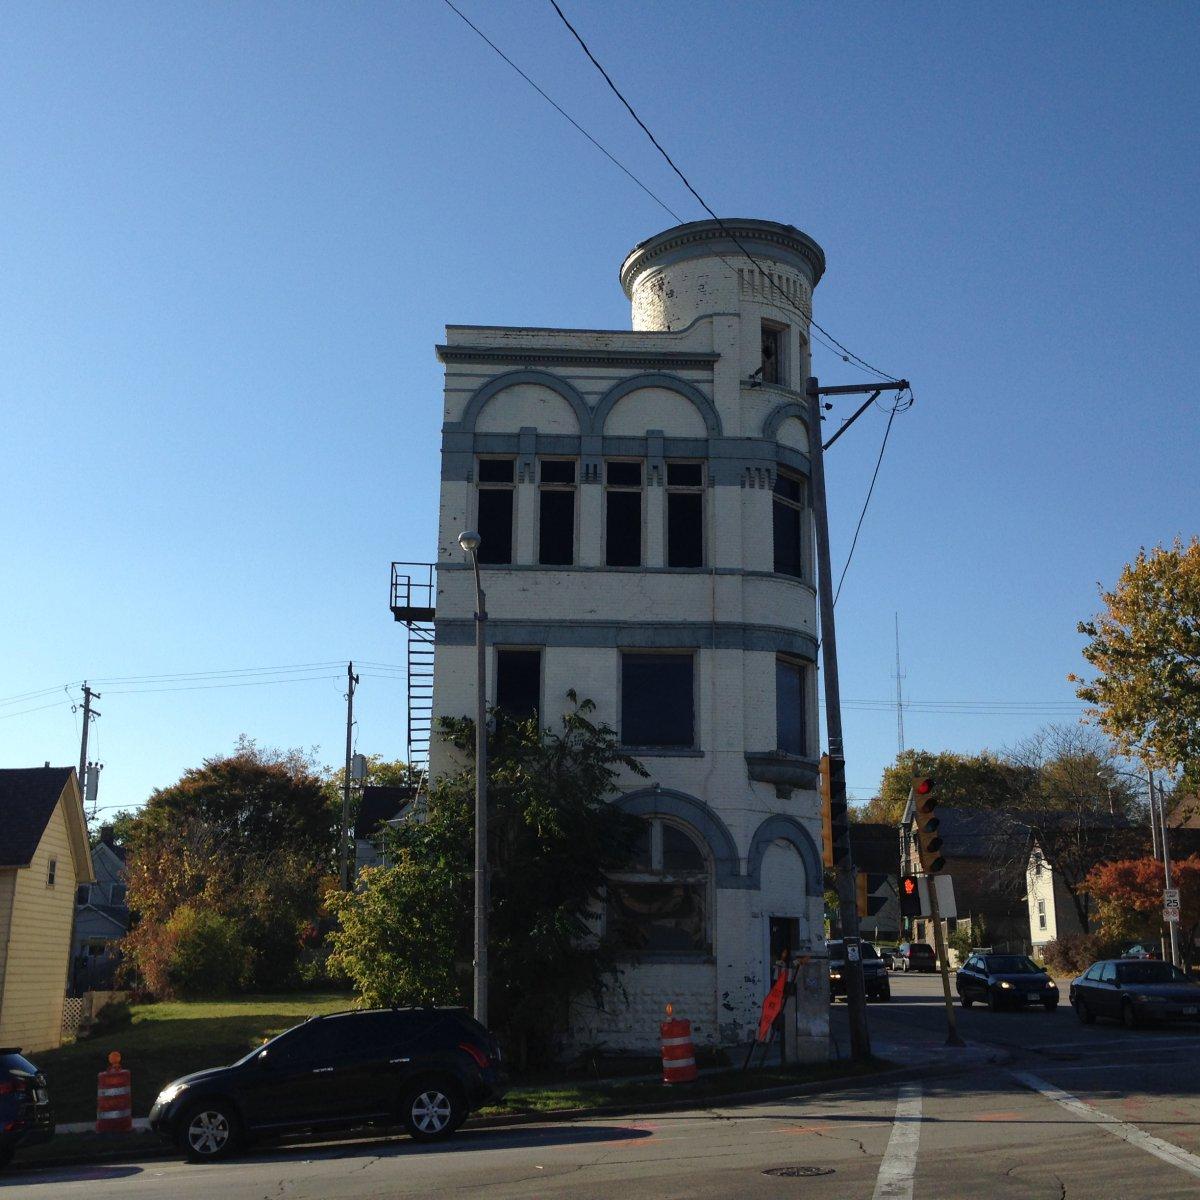 2249 N. Humboldt Ave.